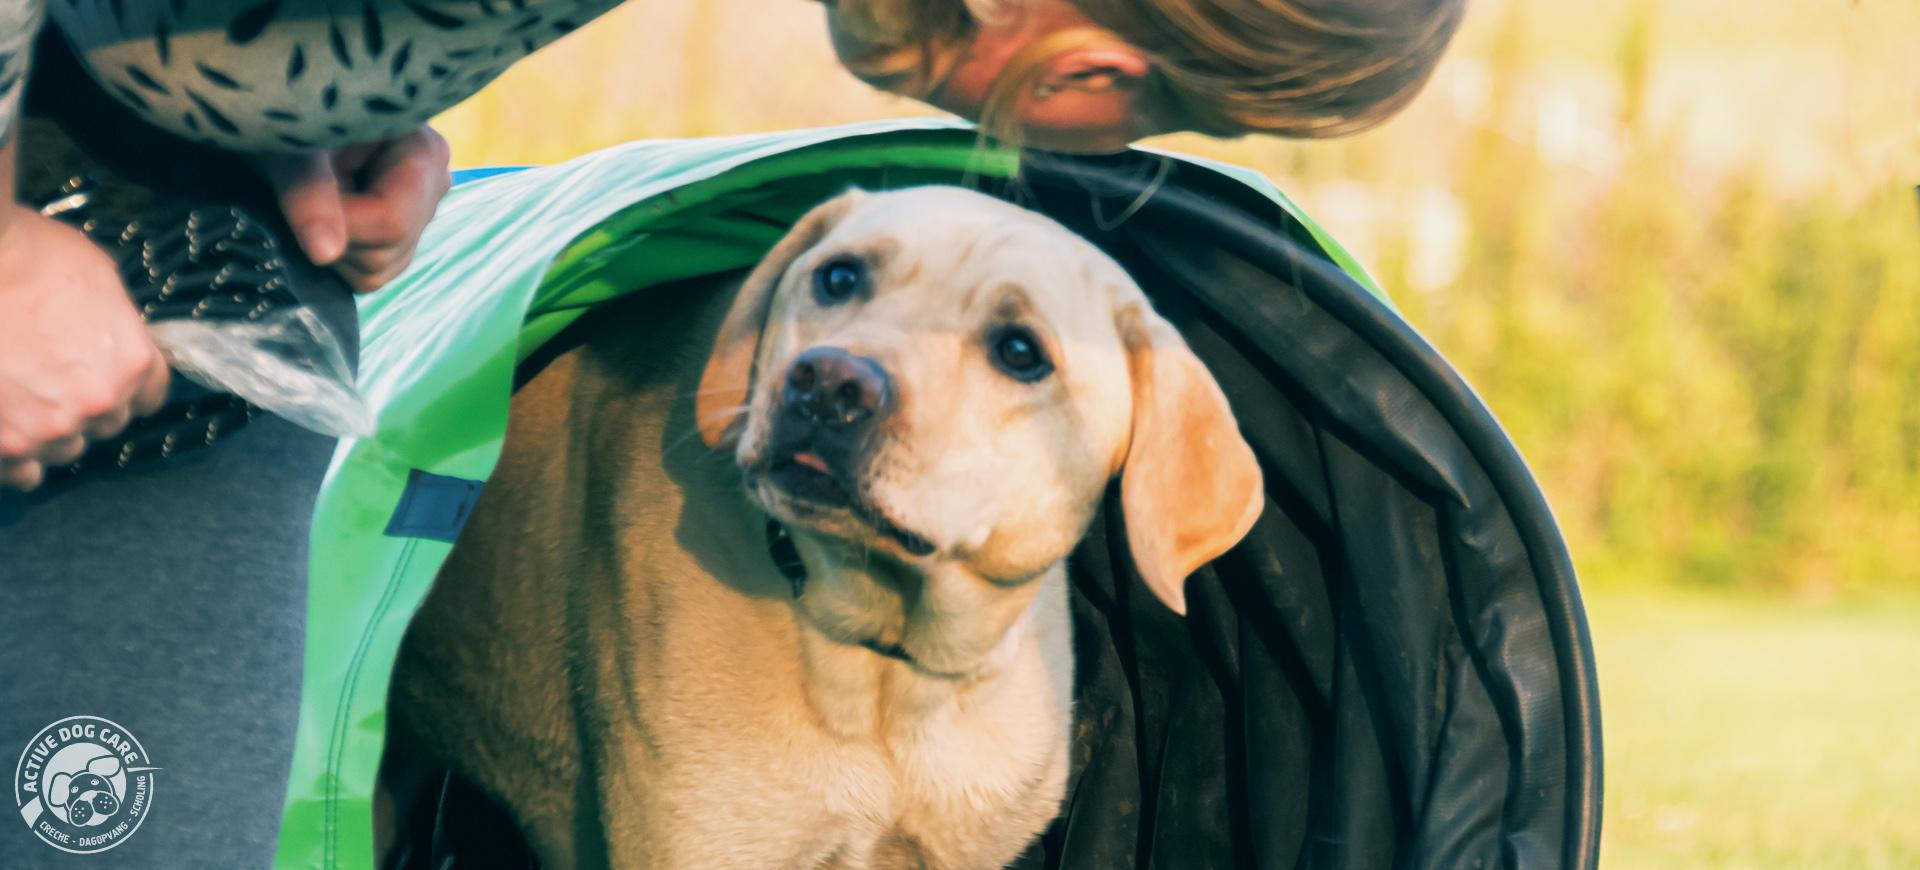 Behendigheid tunnel - hondenschool Active Dog Care